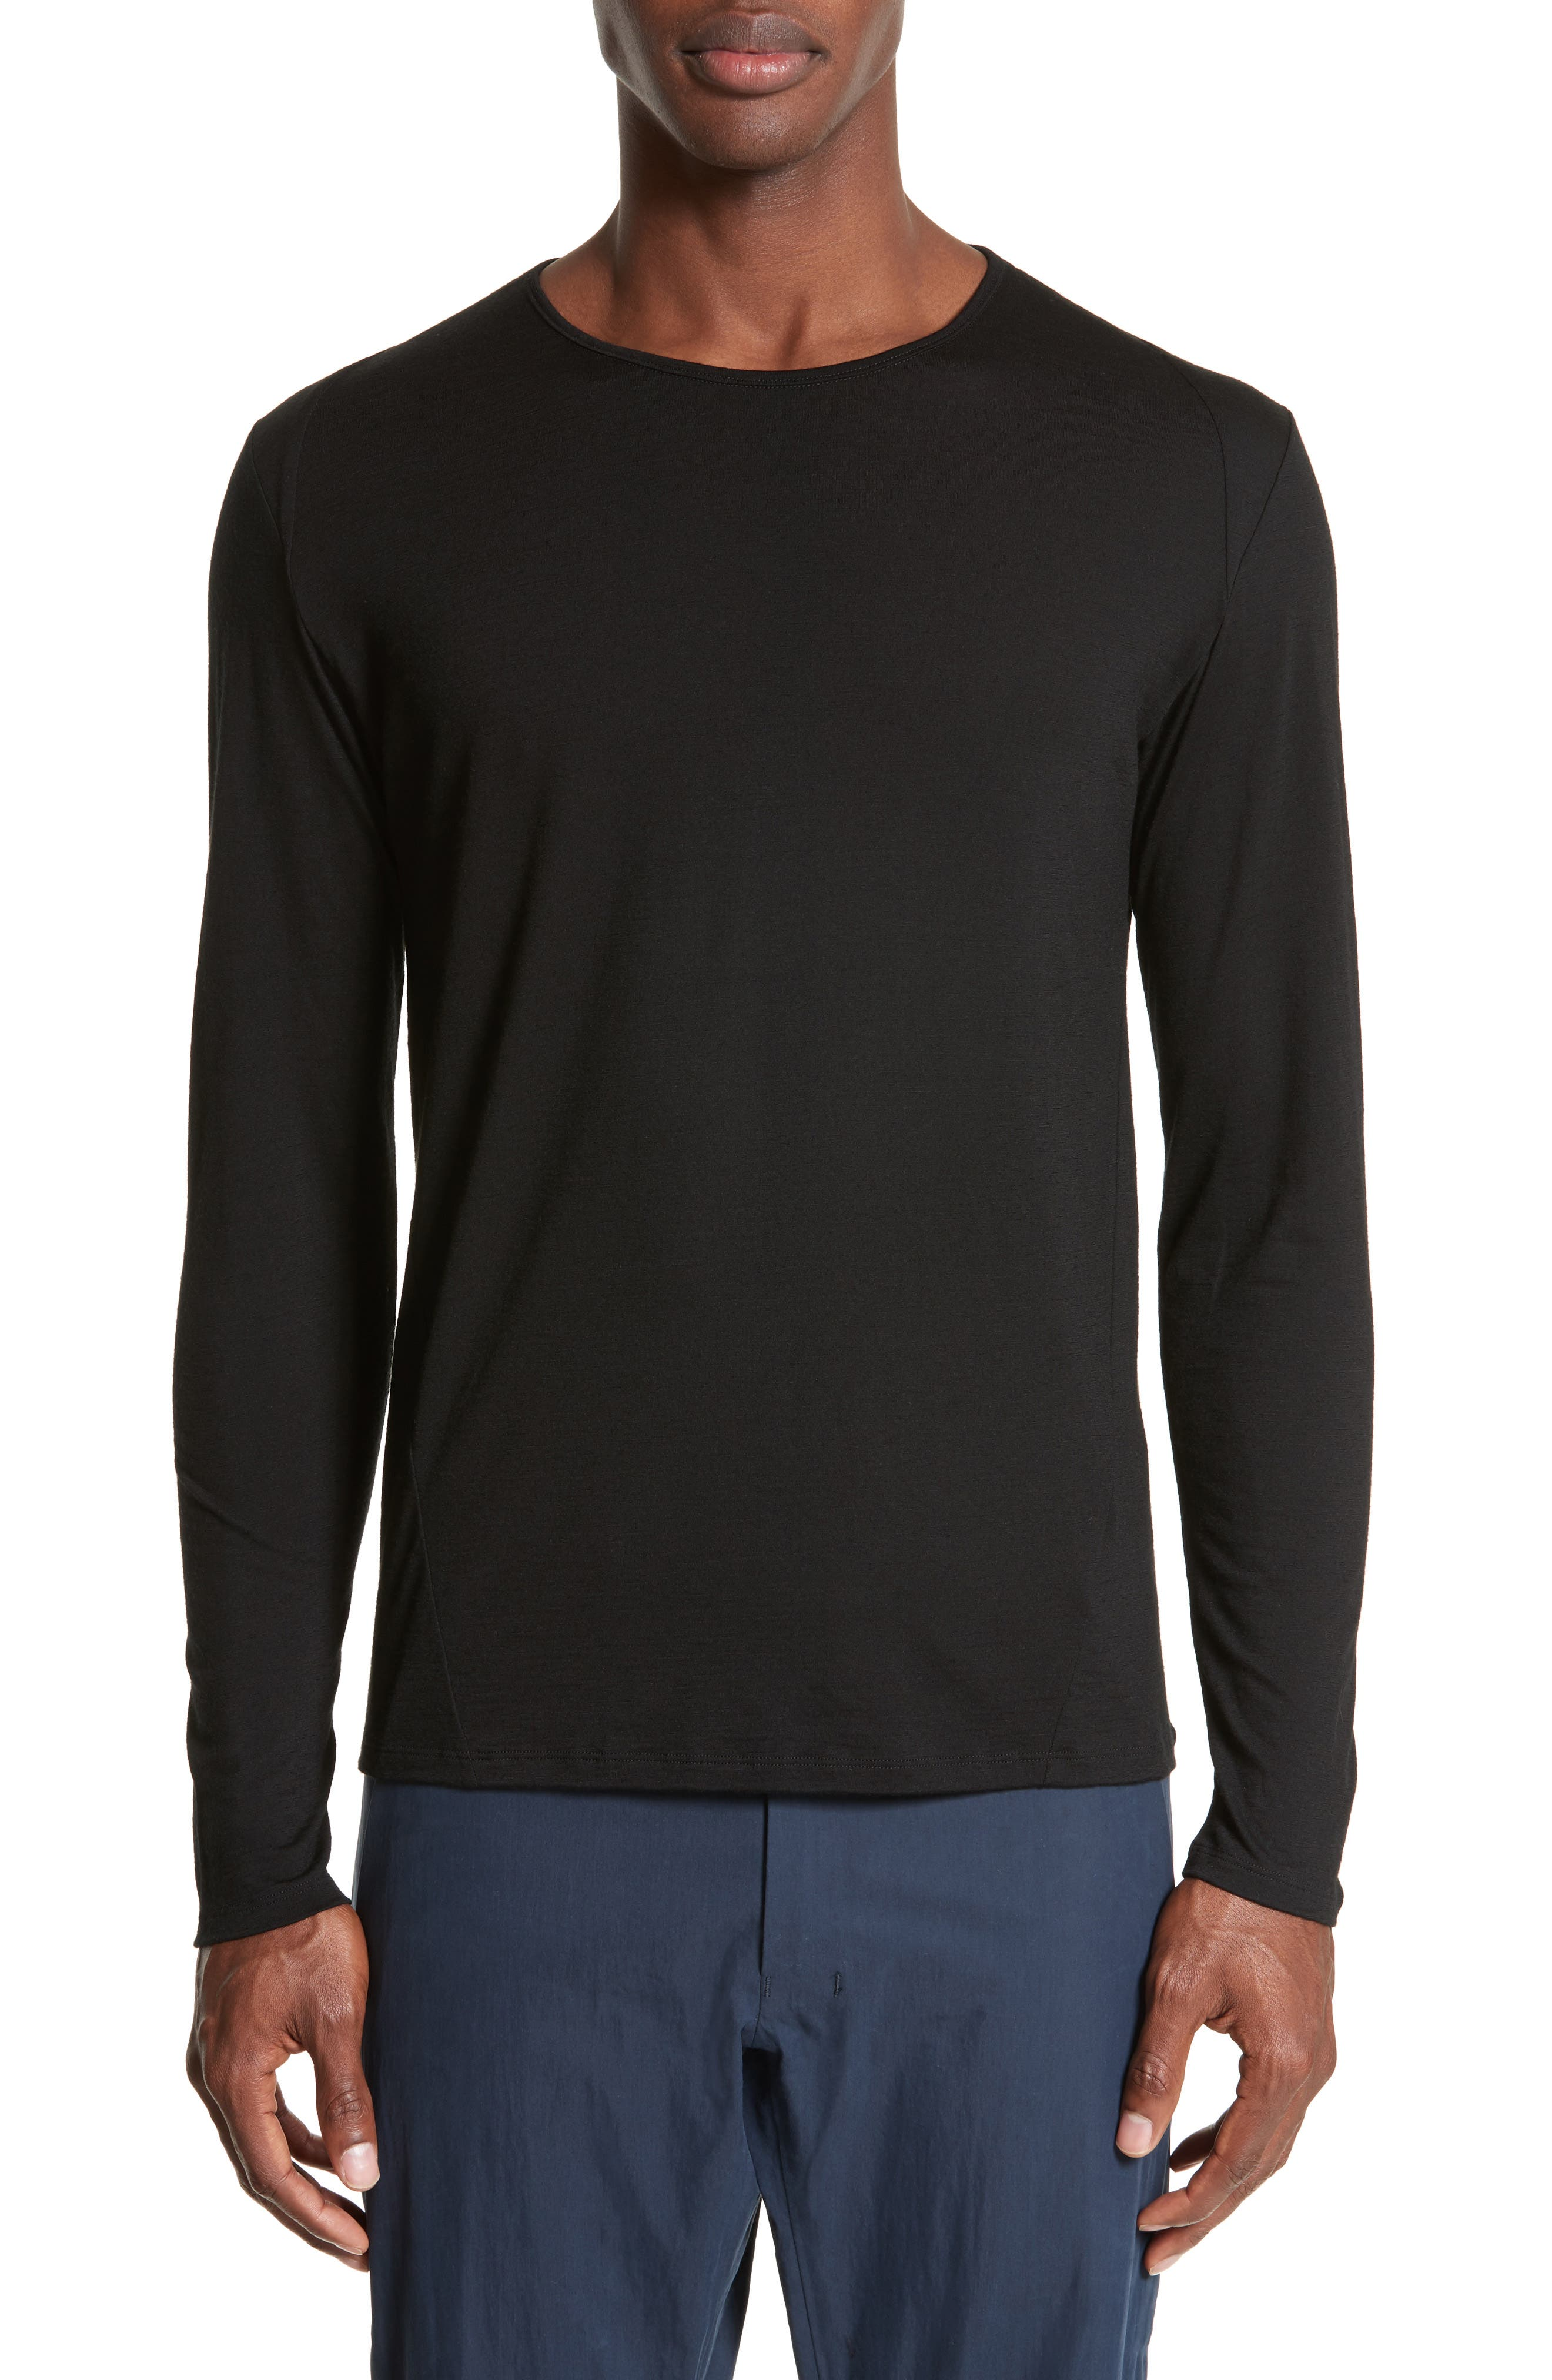 ARC'TERYX VEILANCE Frame Merino Wool T-Shirt